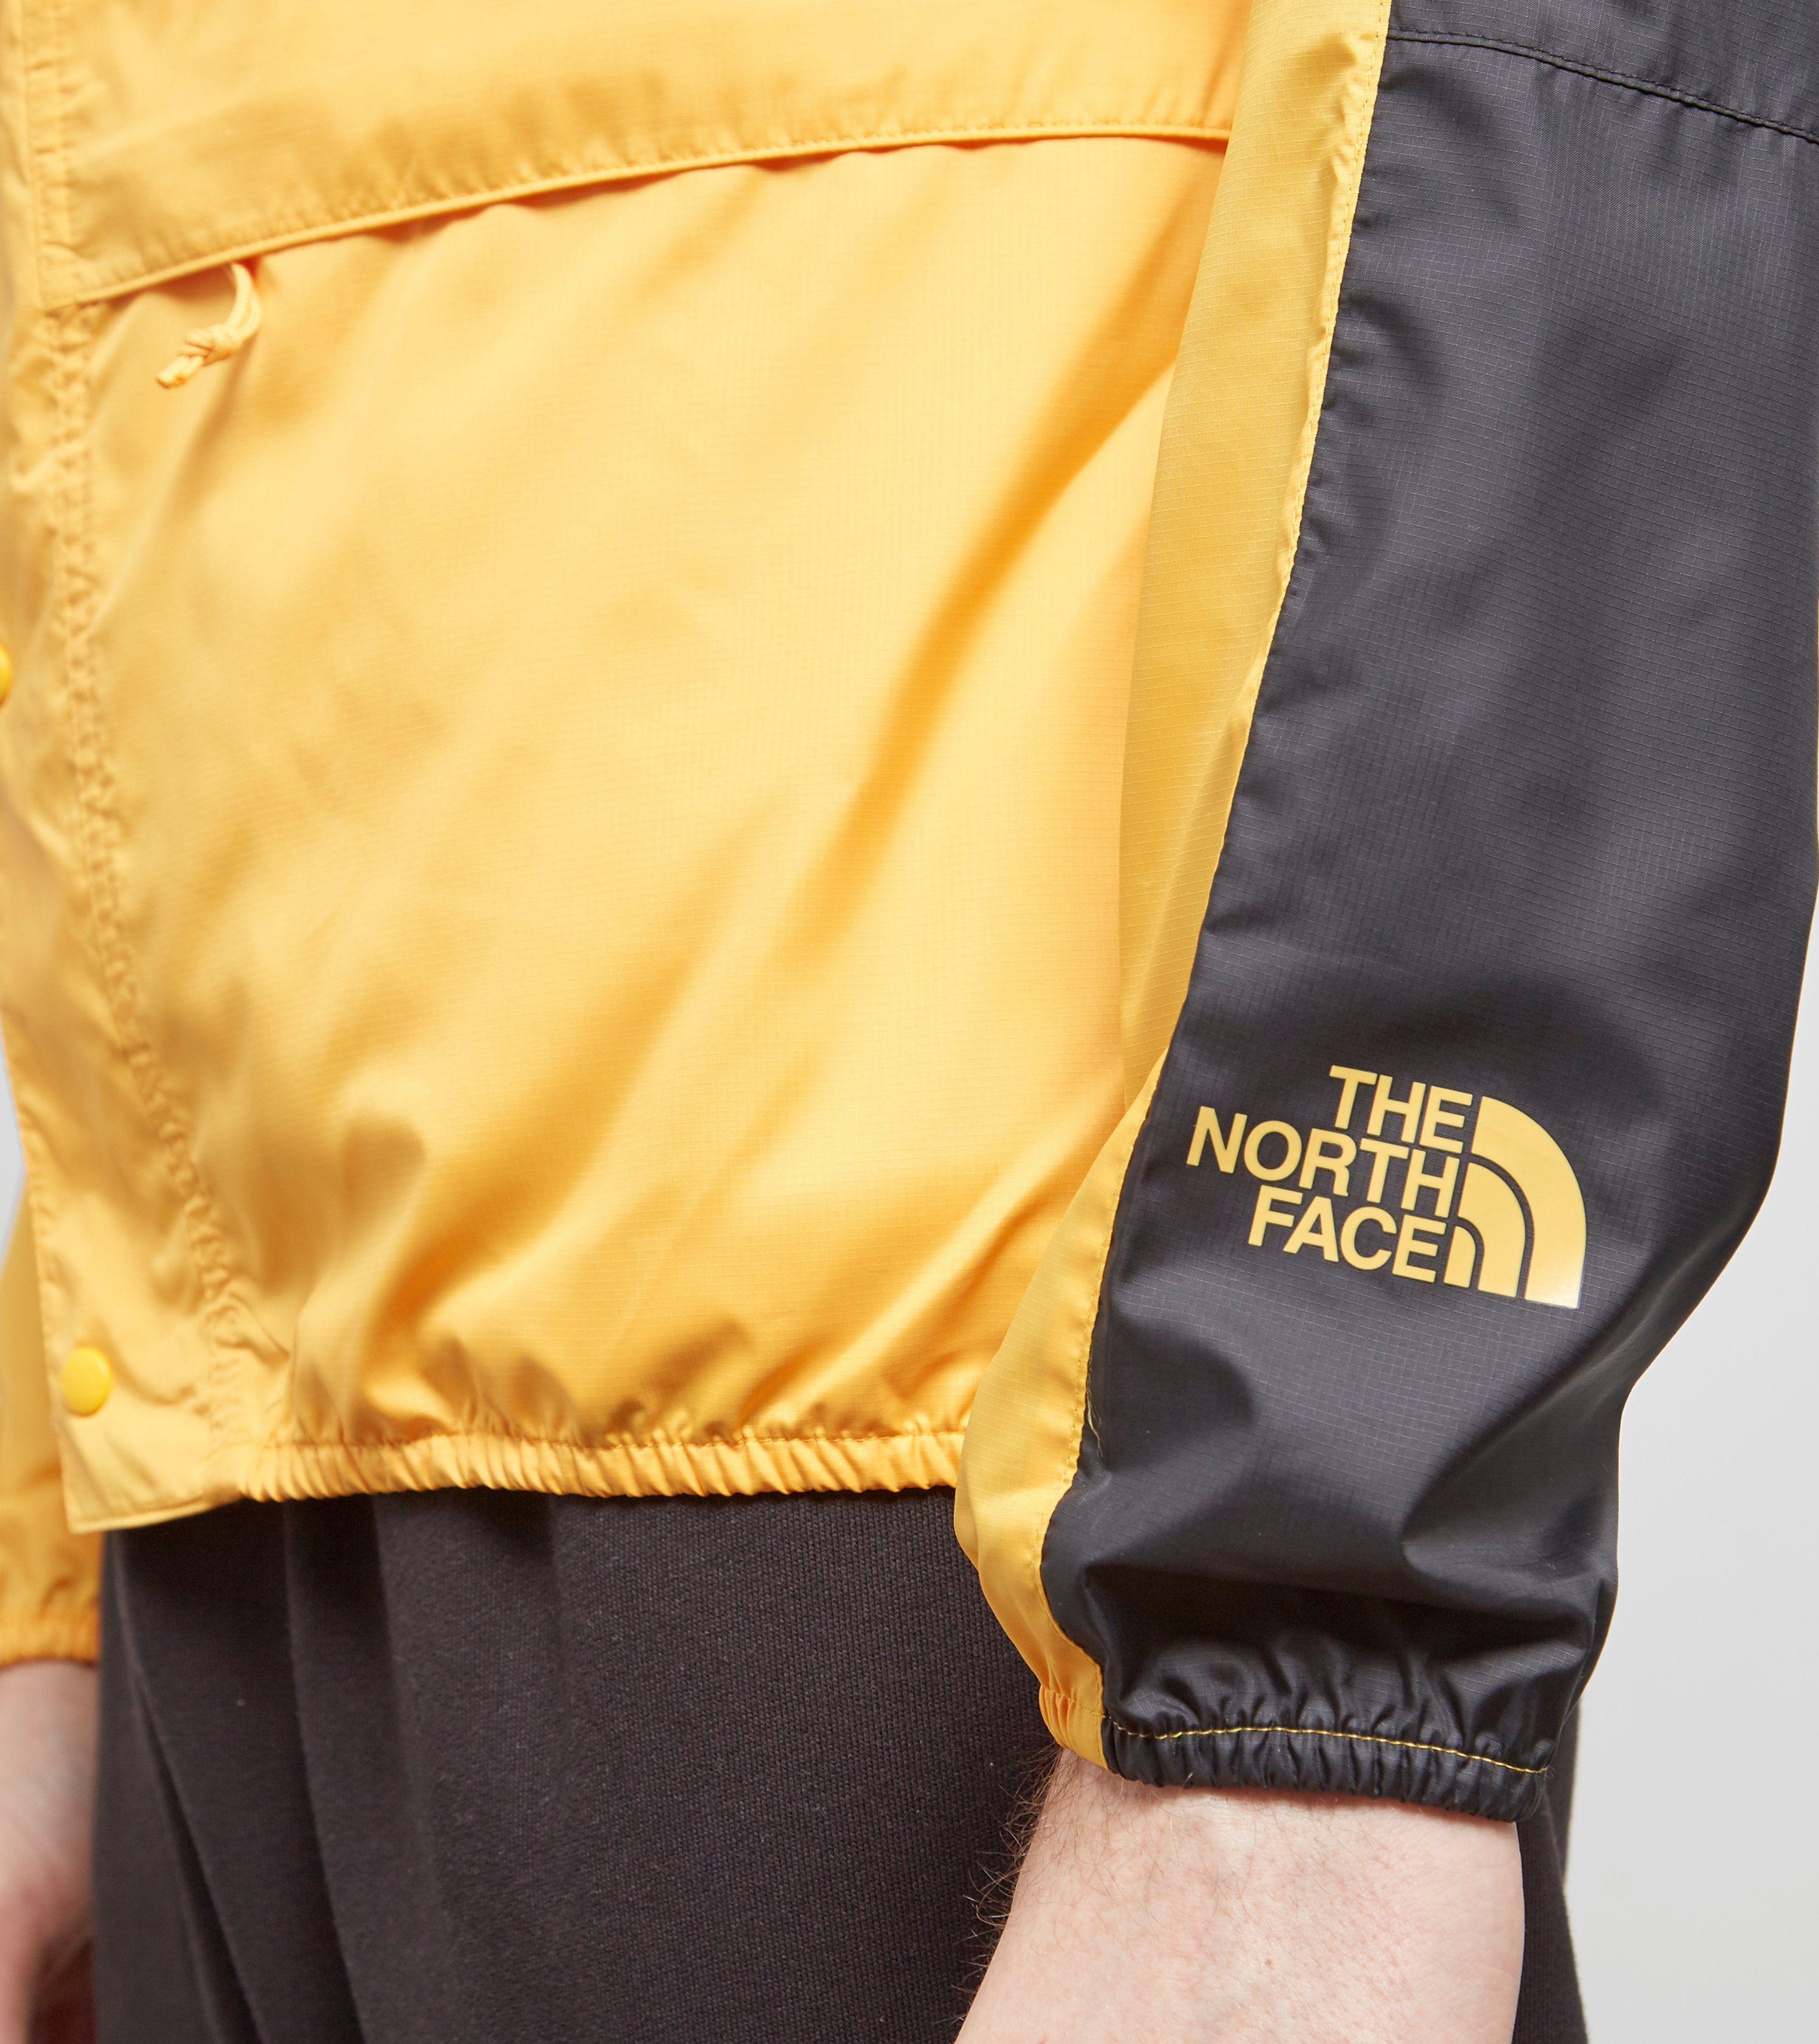 The North Face 1985 Seasonal Jacket